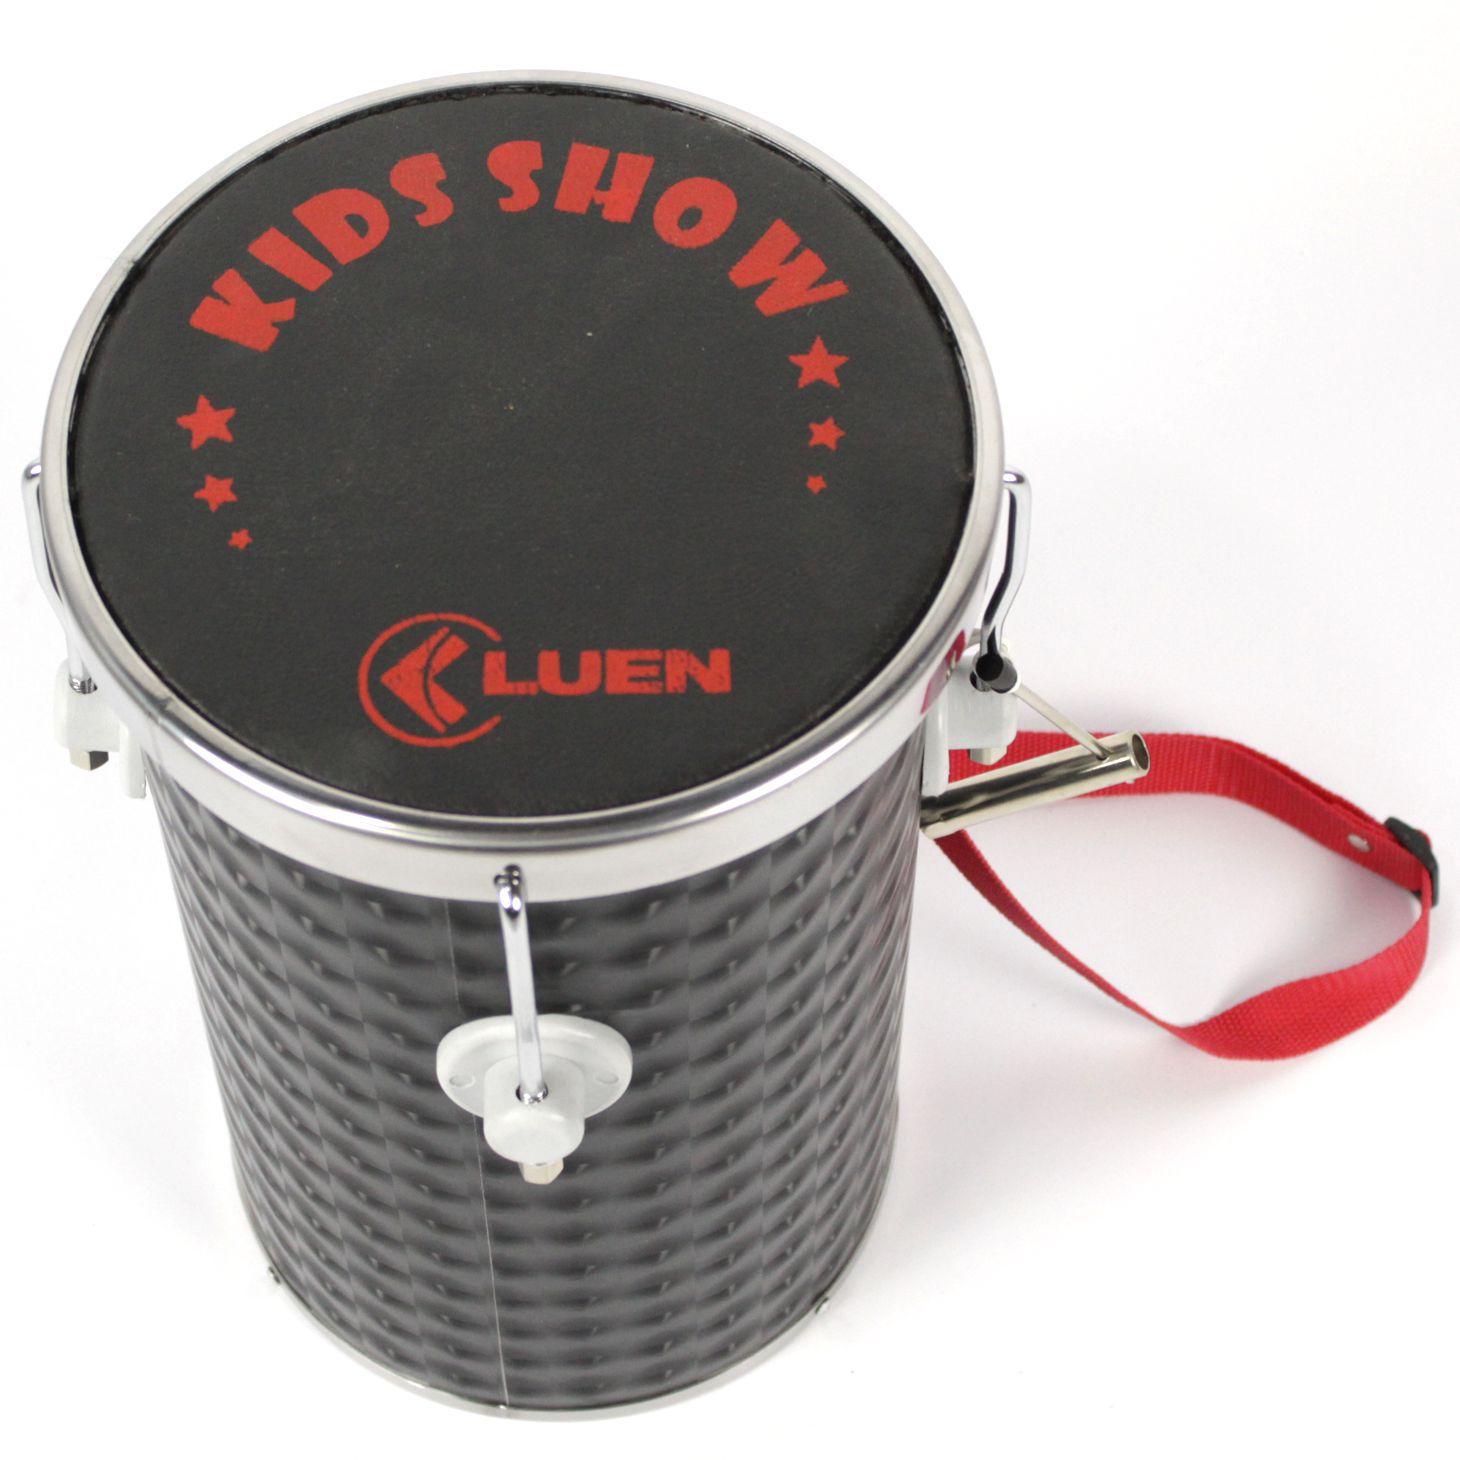 "Rebolo Infantil Luen KIDS SHOW 35 X 08"" - Preto - 29464PT"